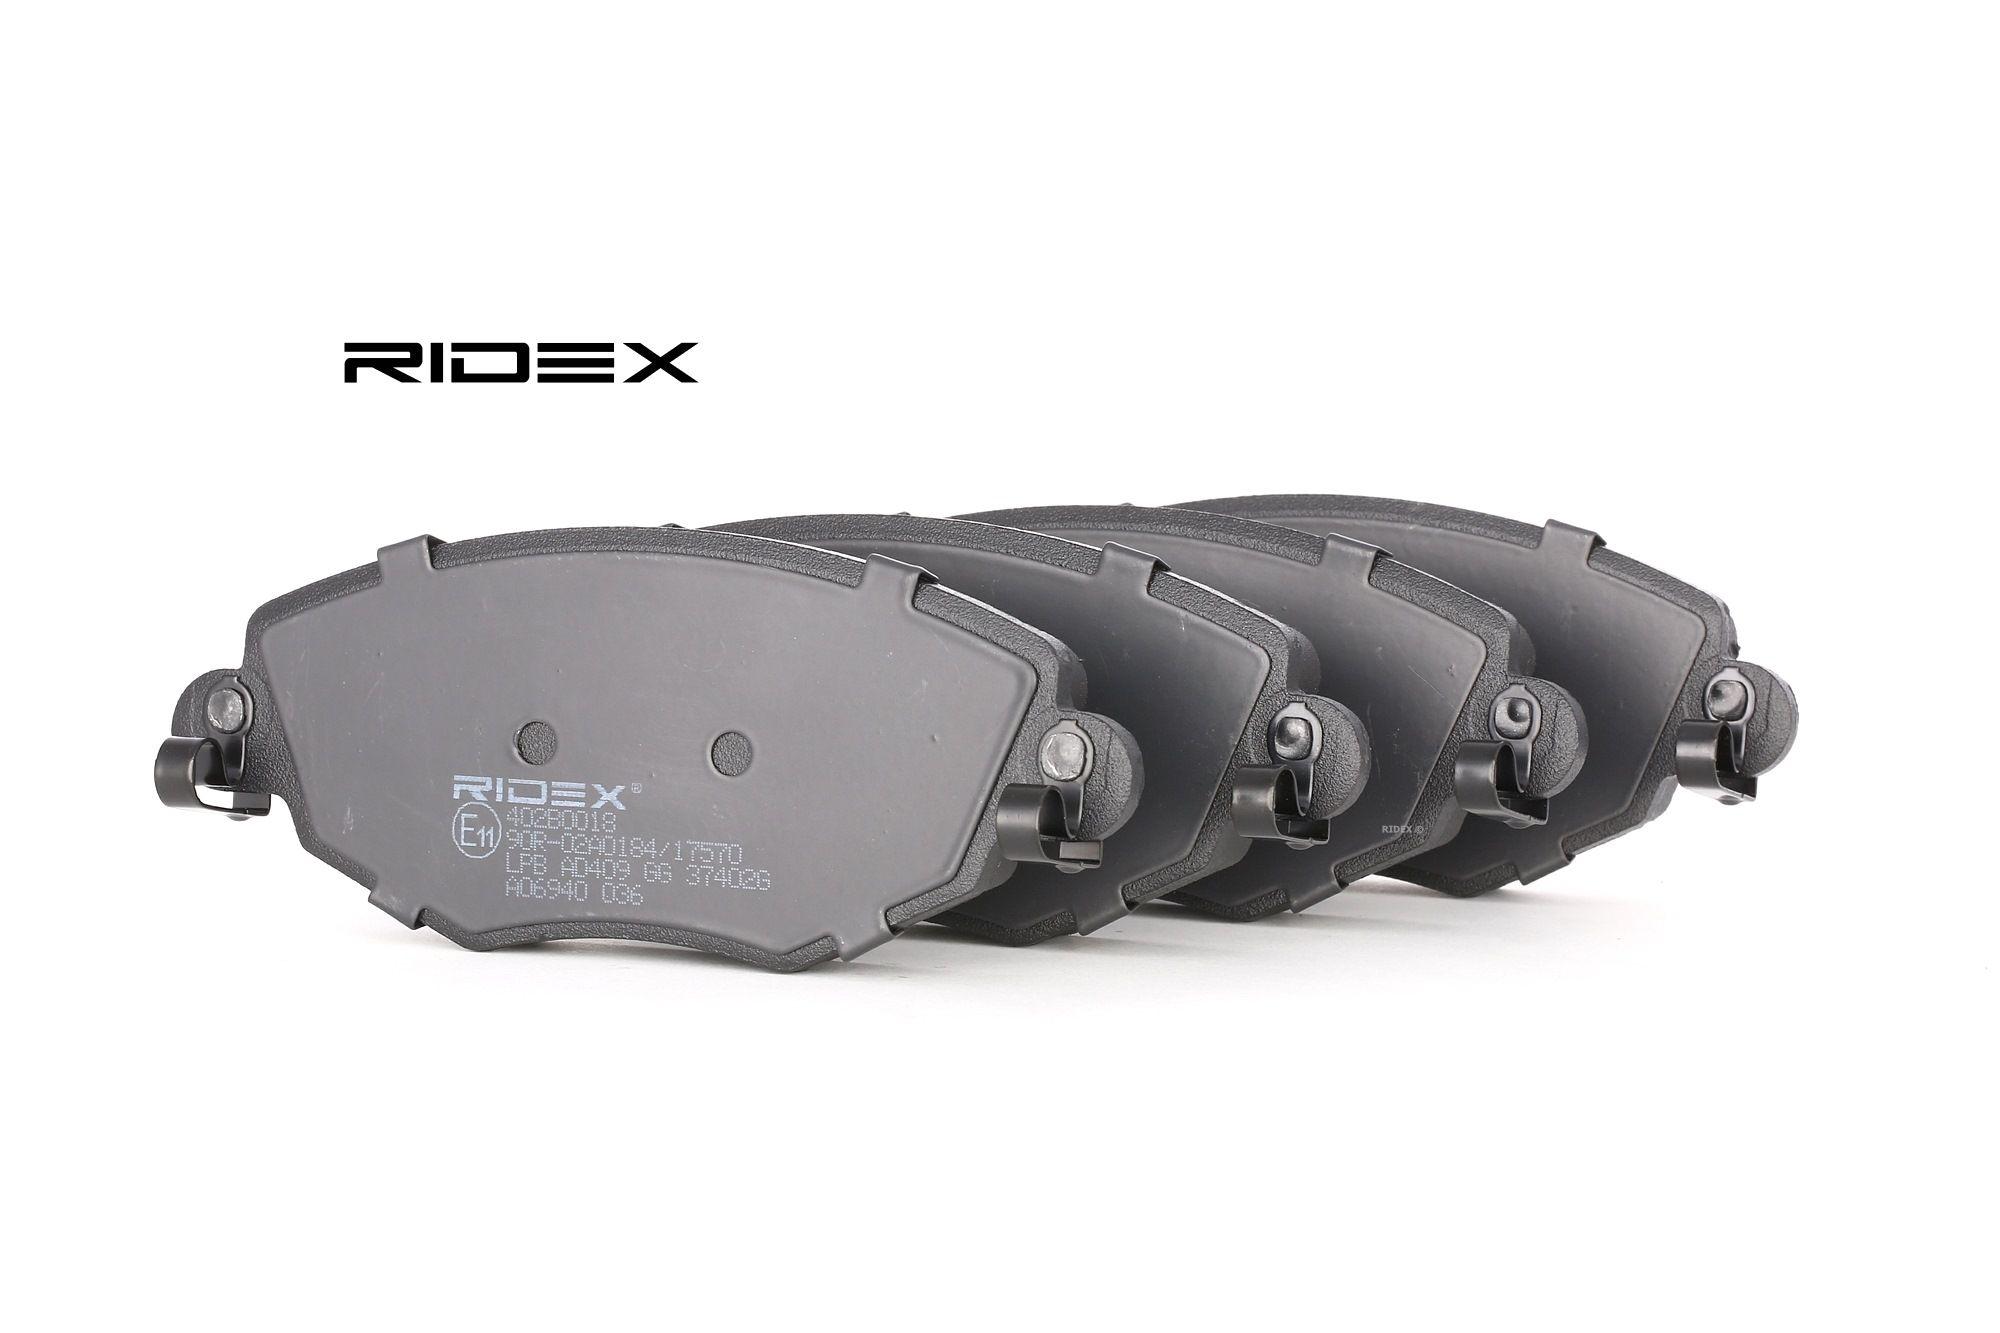 Bremsbelagsatz RIDEX 402B0018